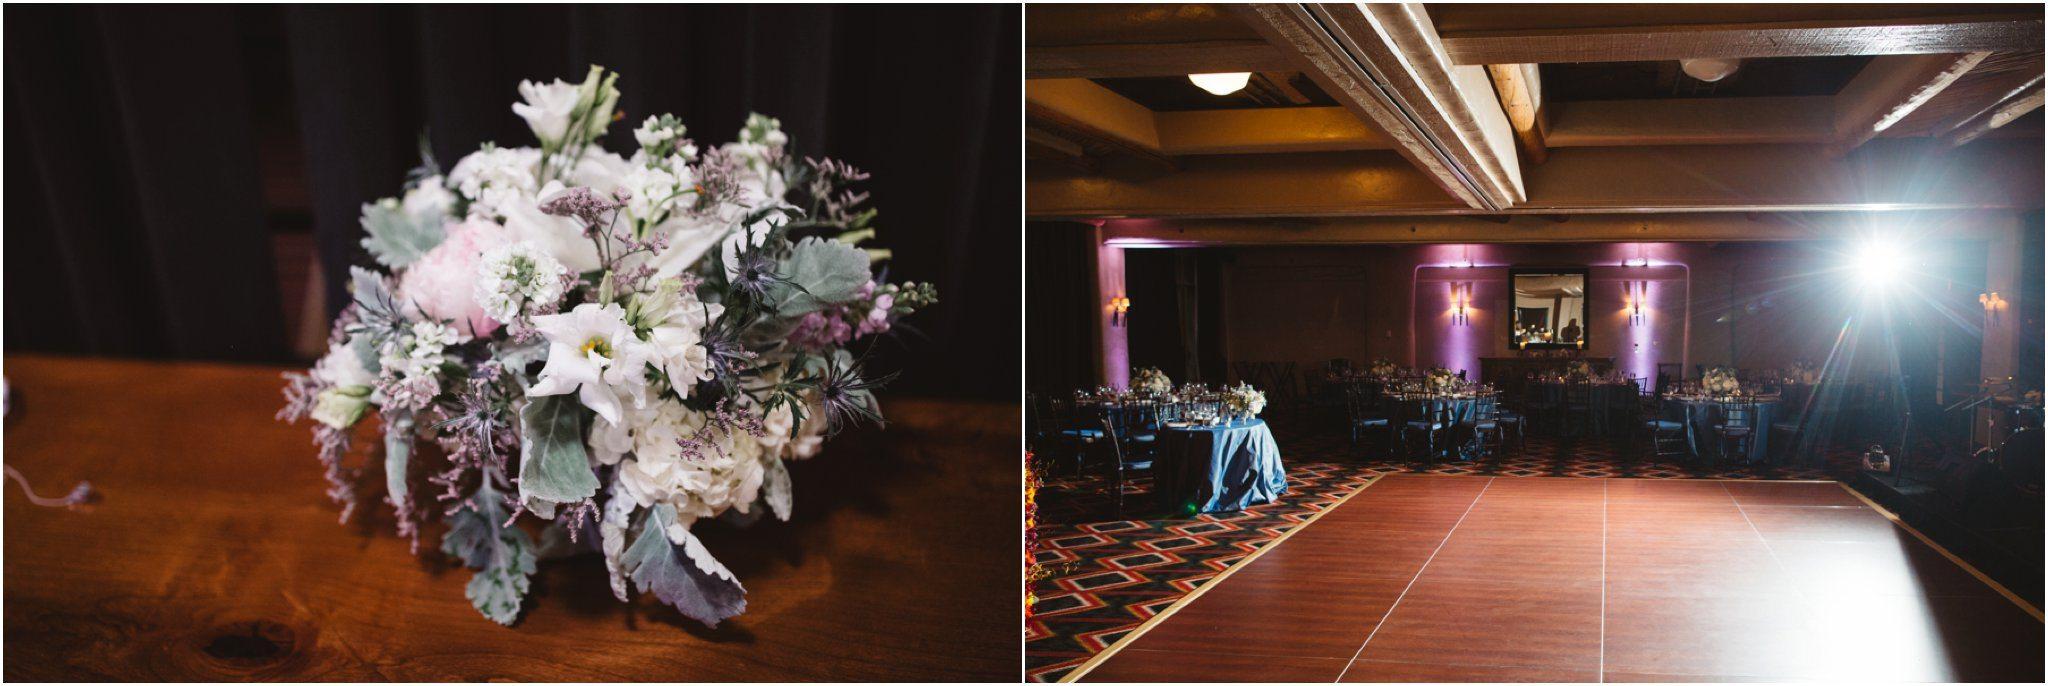 0027new-mexico-same-sex-wedding_santa-fe-wedding-photographer_albuquerque-wedding-photographer_top-photographer_-southwest-wedding-photography_-blue-rose-studio